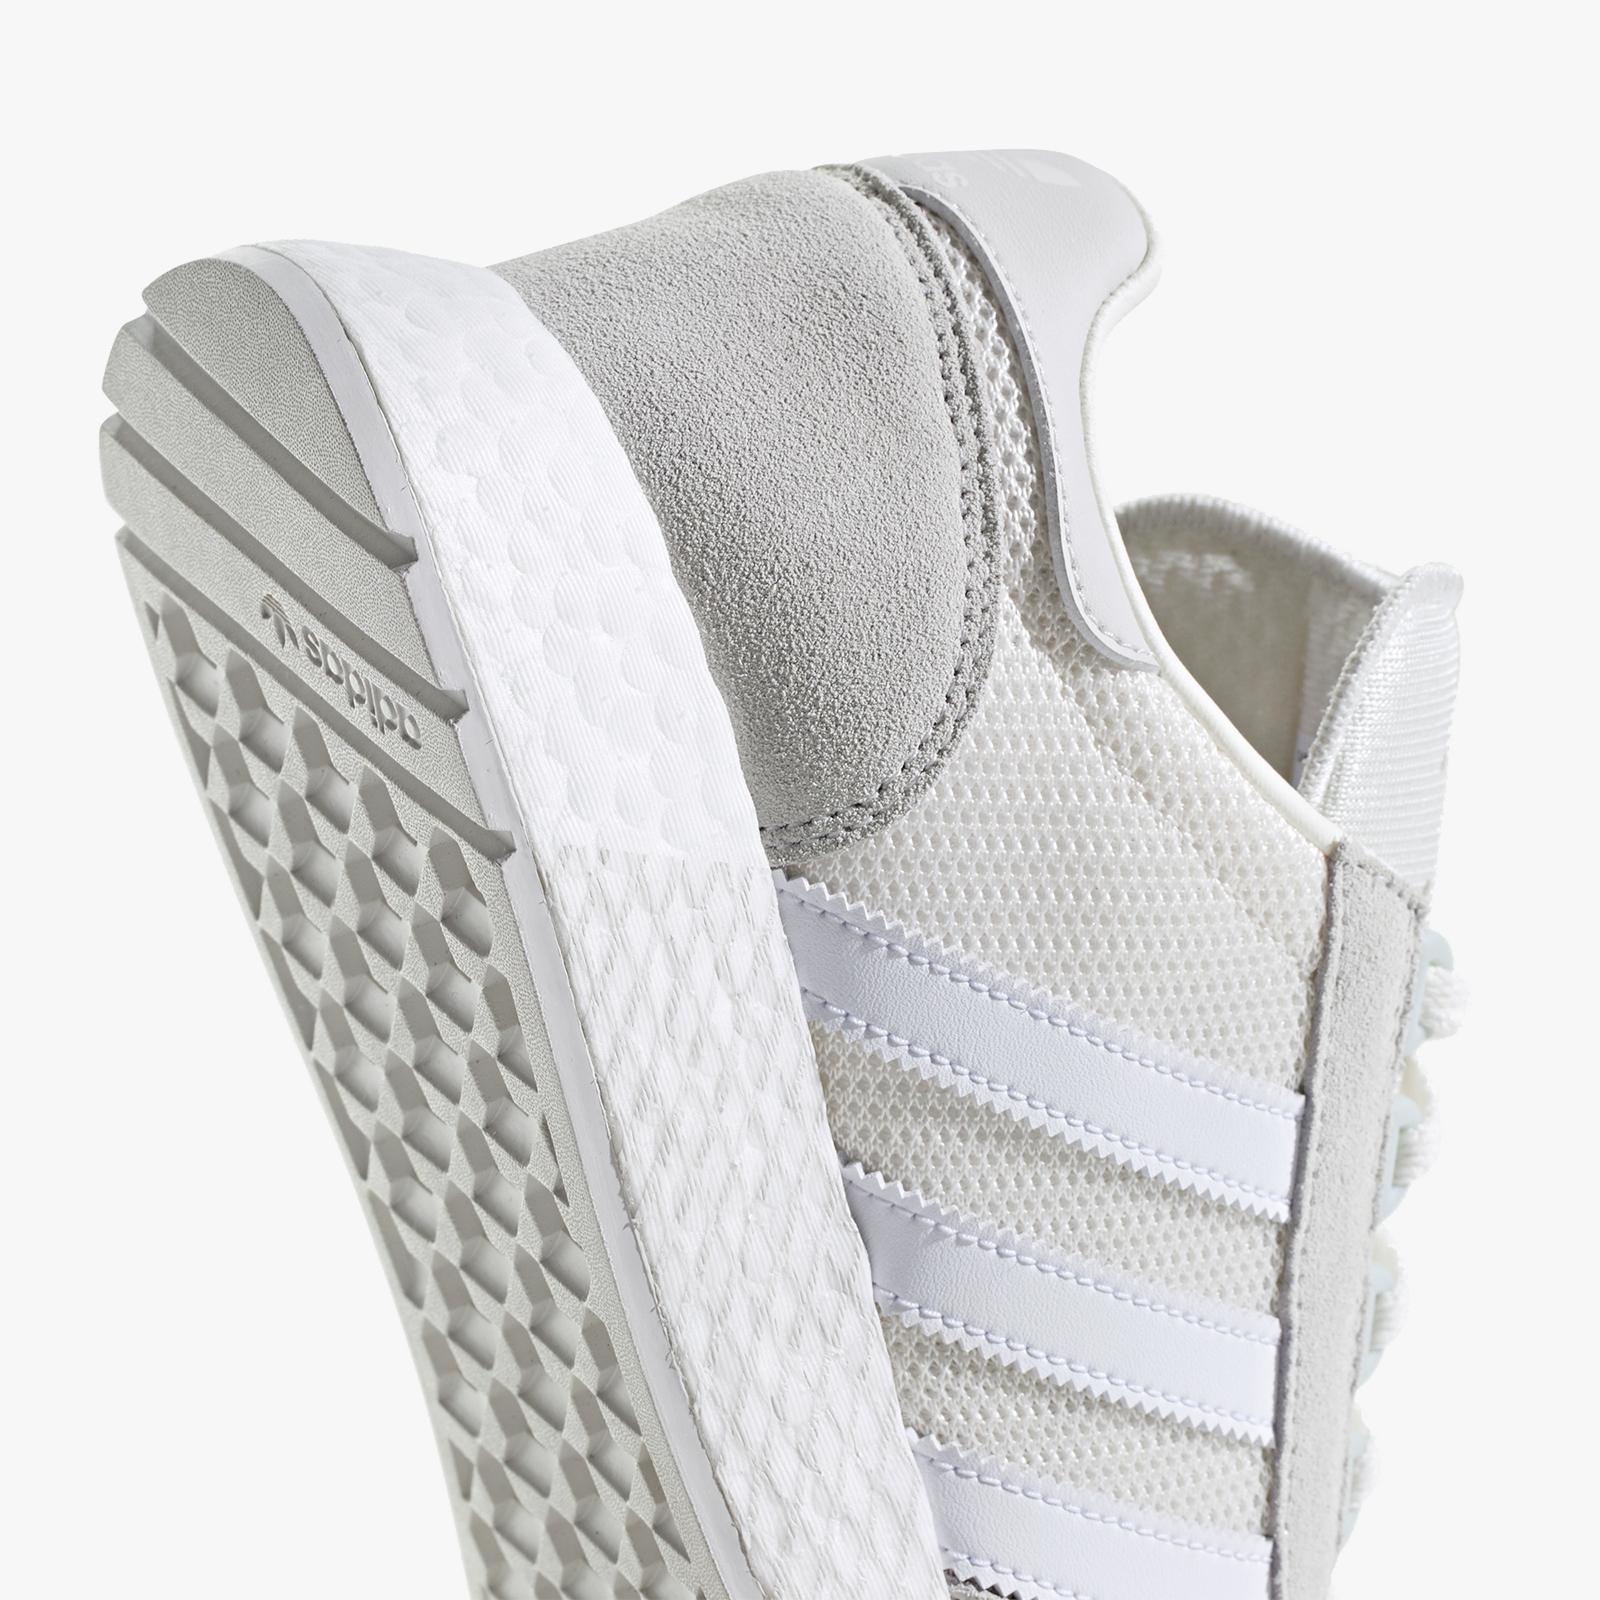 best sneakers 489a0 7ff09 ... adidas Originals Marathon x 5923